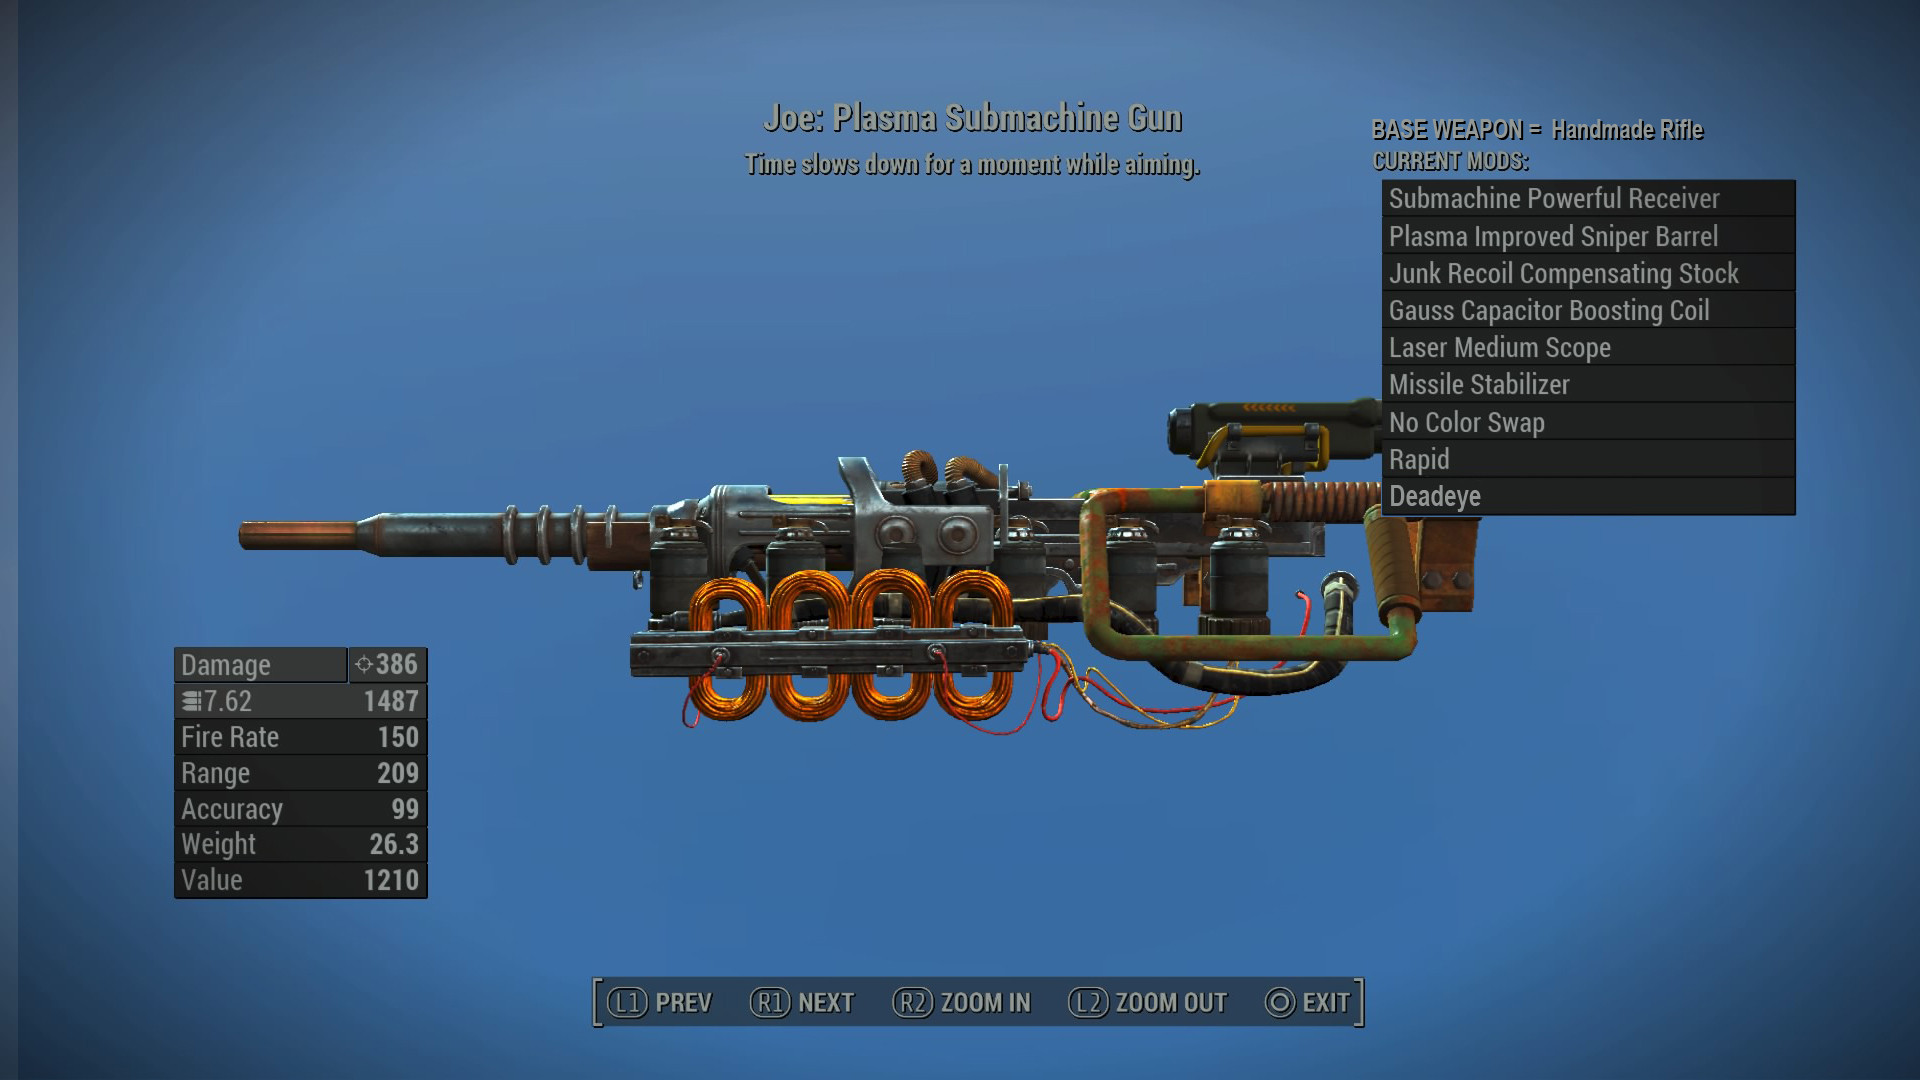 Plasma Sub-machine Gun